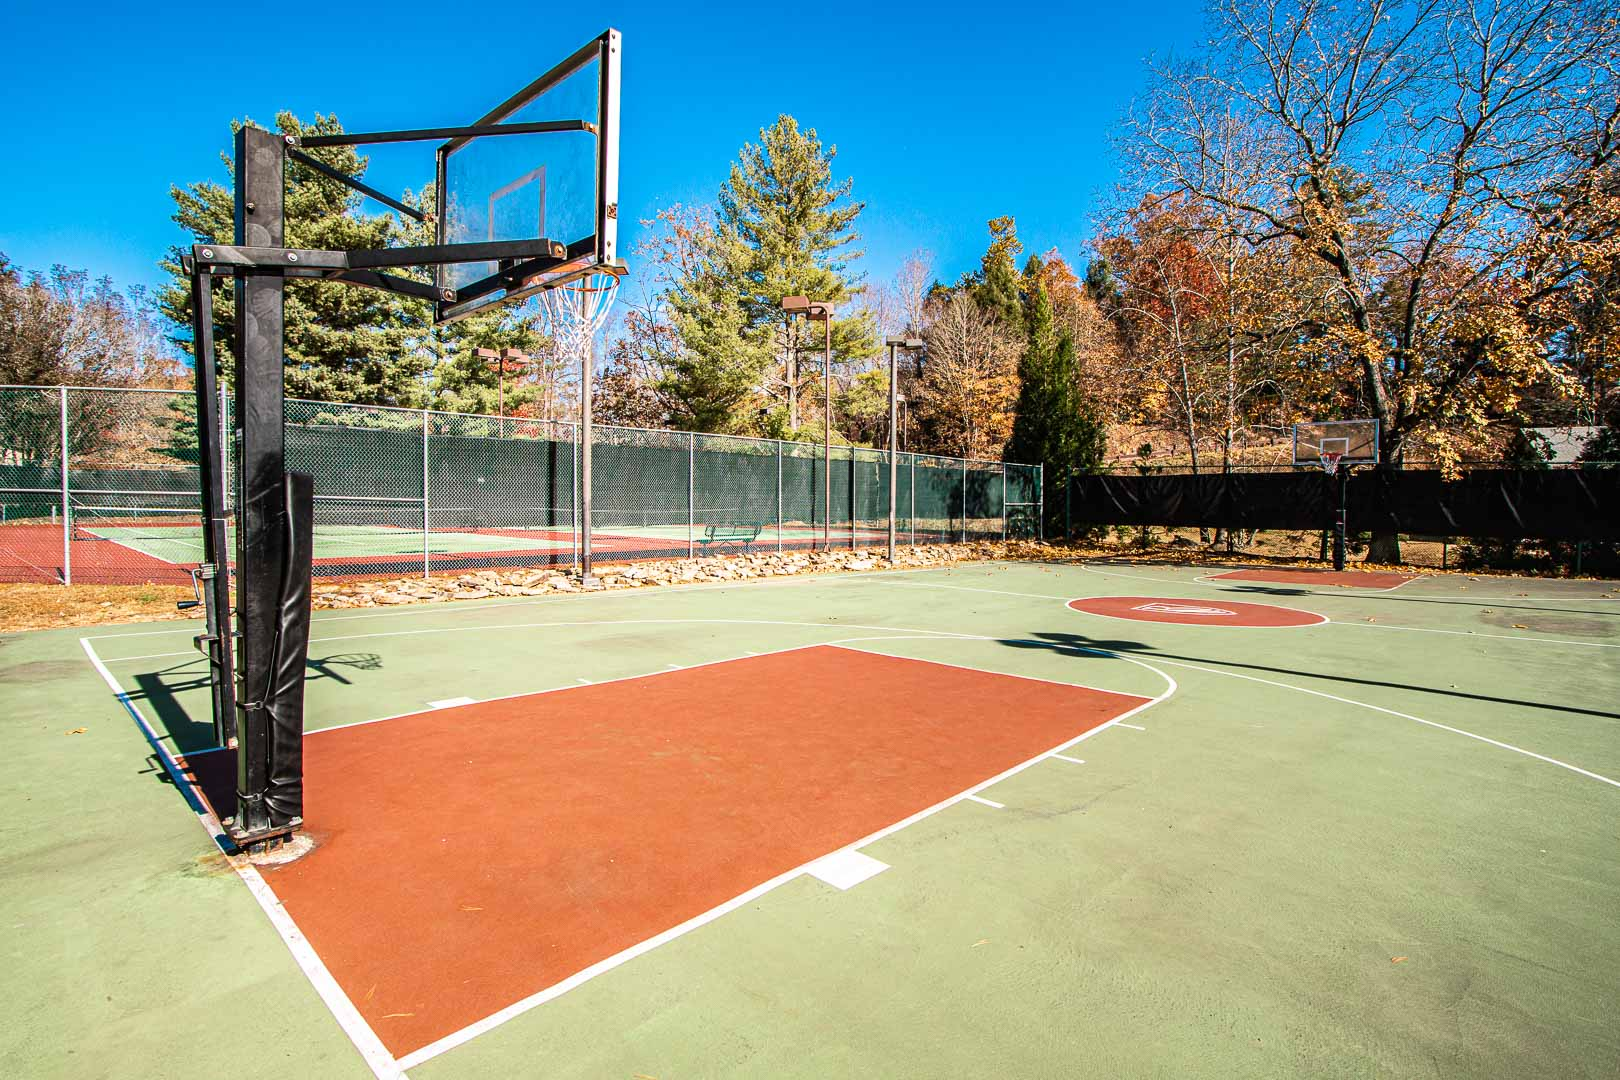 A spacious outdoor basketball court at VRI's Fox Run Resort in North Carolina.